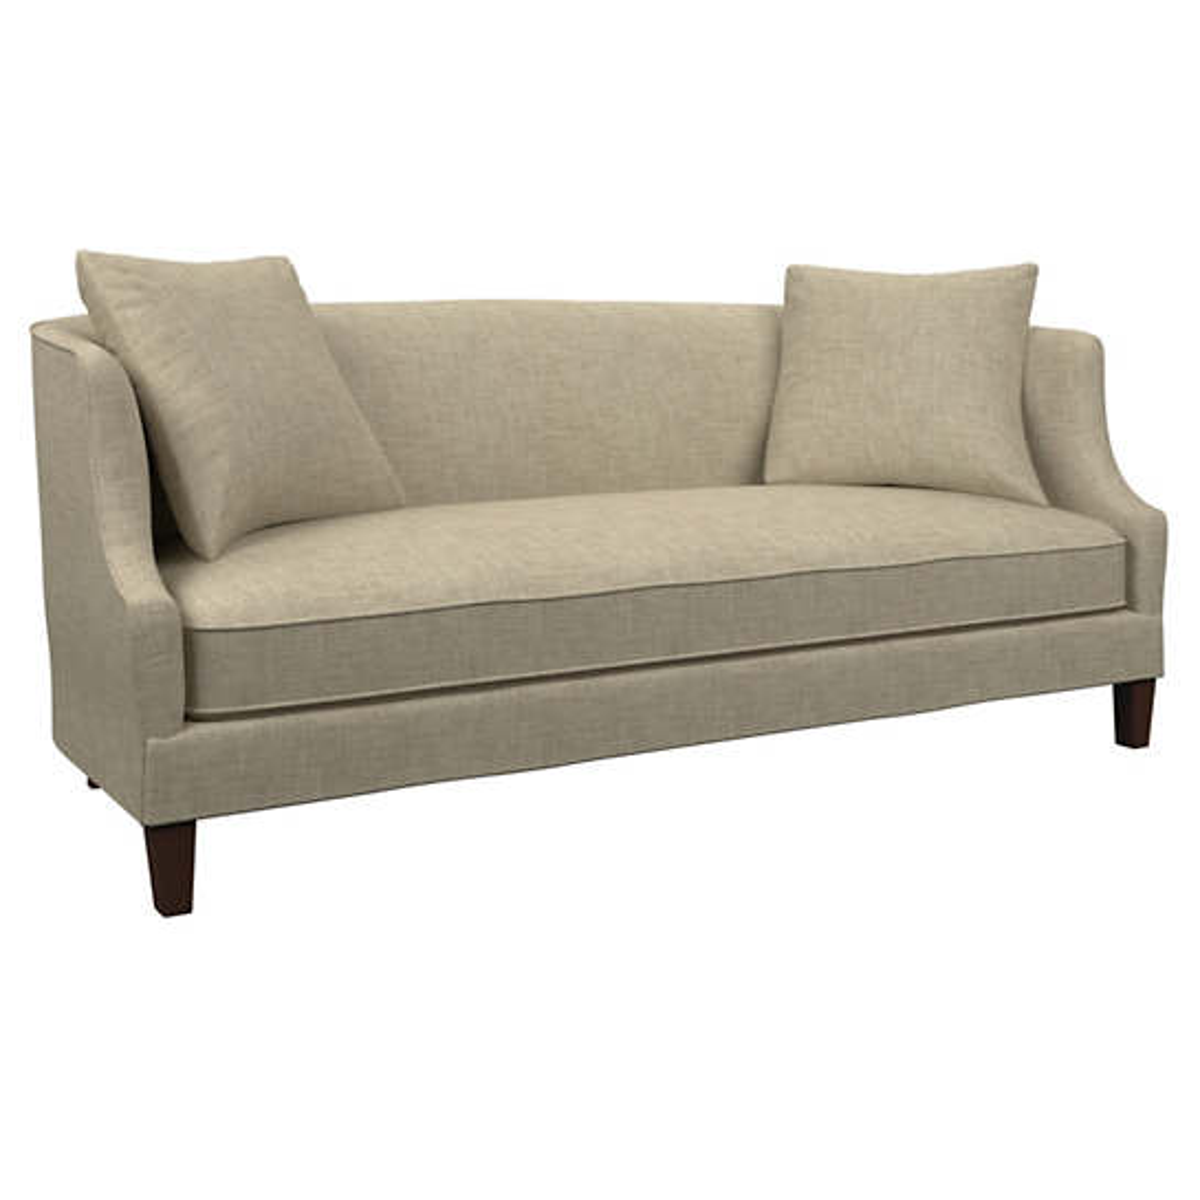 Greylock Grey Cheshire Sofa